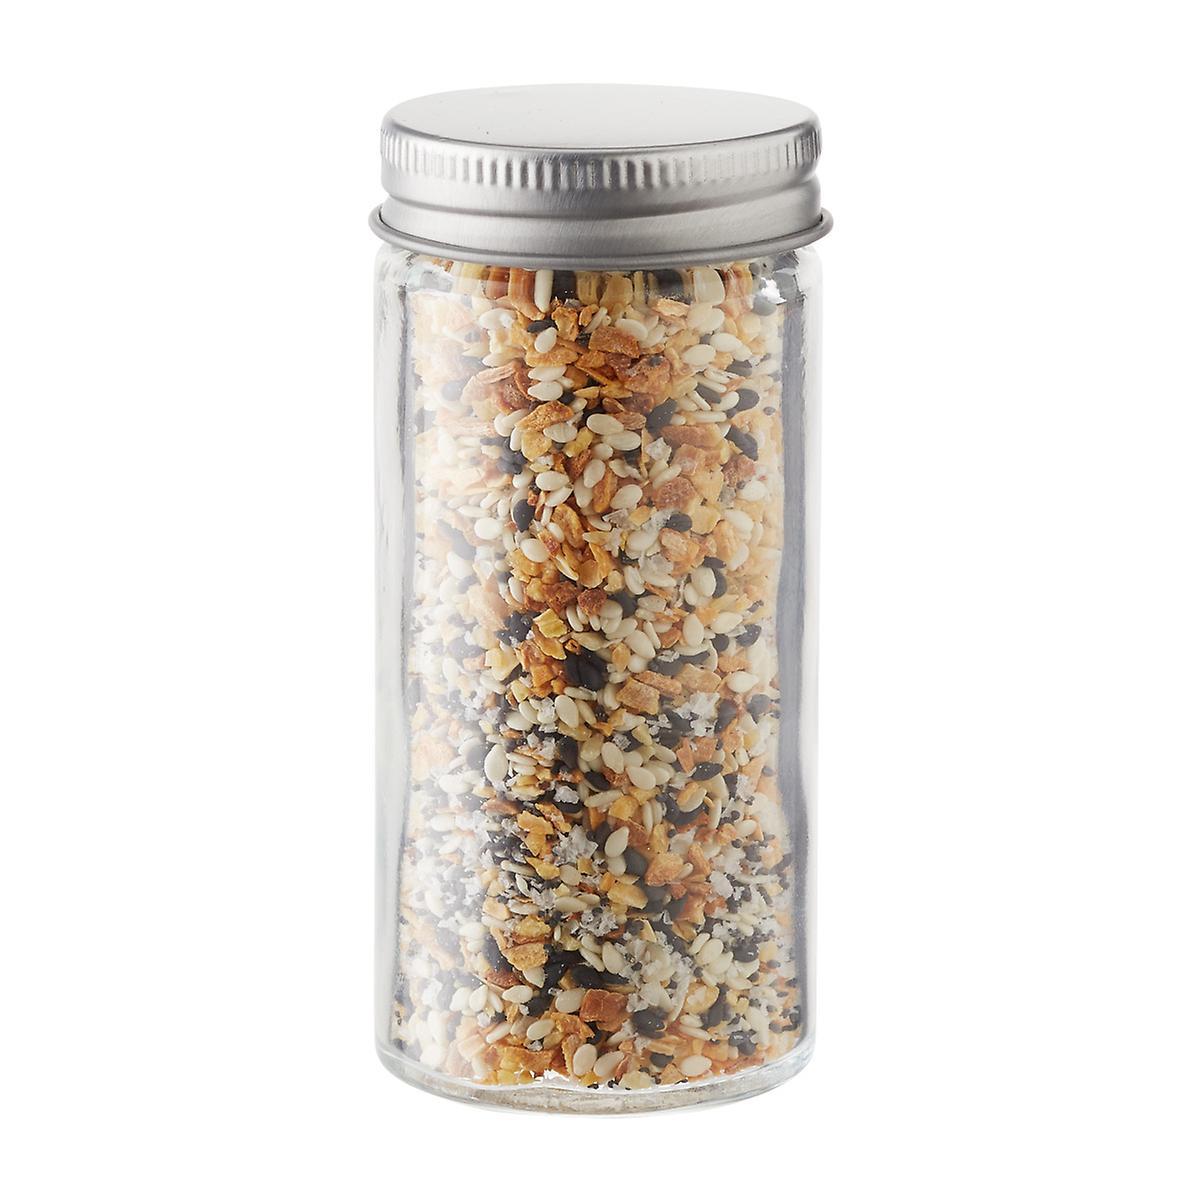 1029818-3oz-spice-jar-brushed-chrome